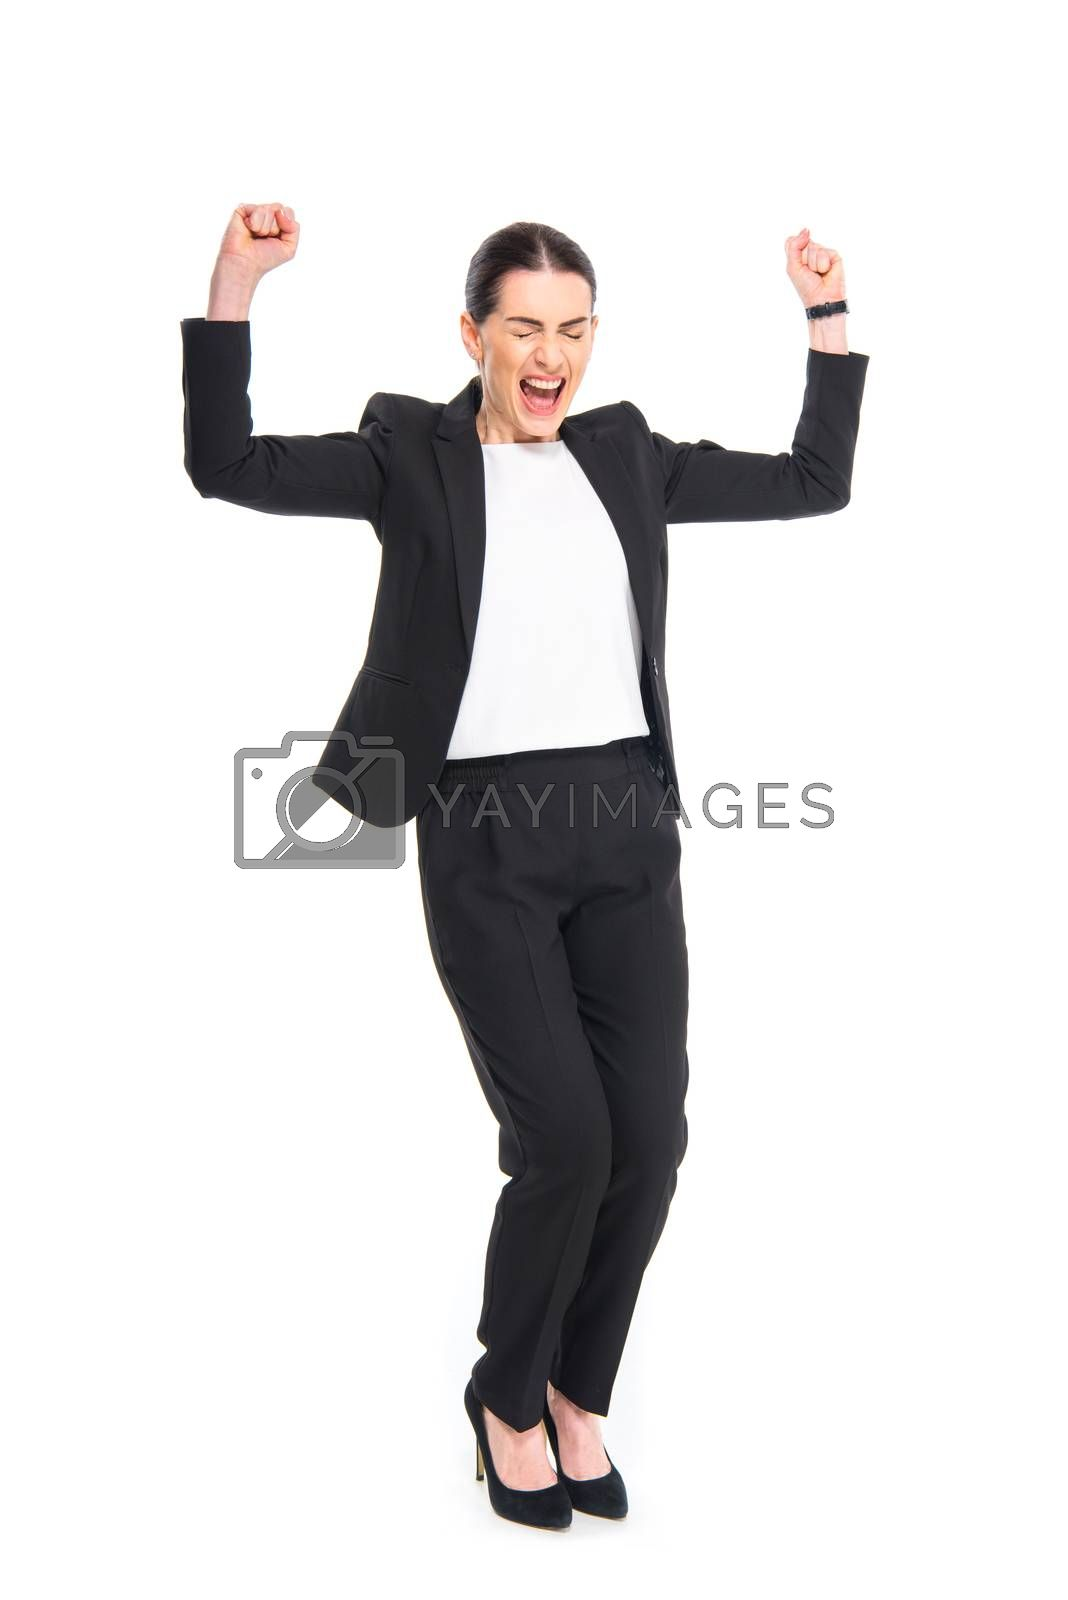 Cheerful businesswoman triumphing by LightFieldStudios